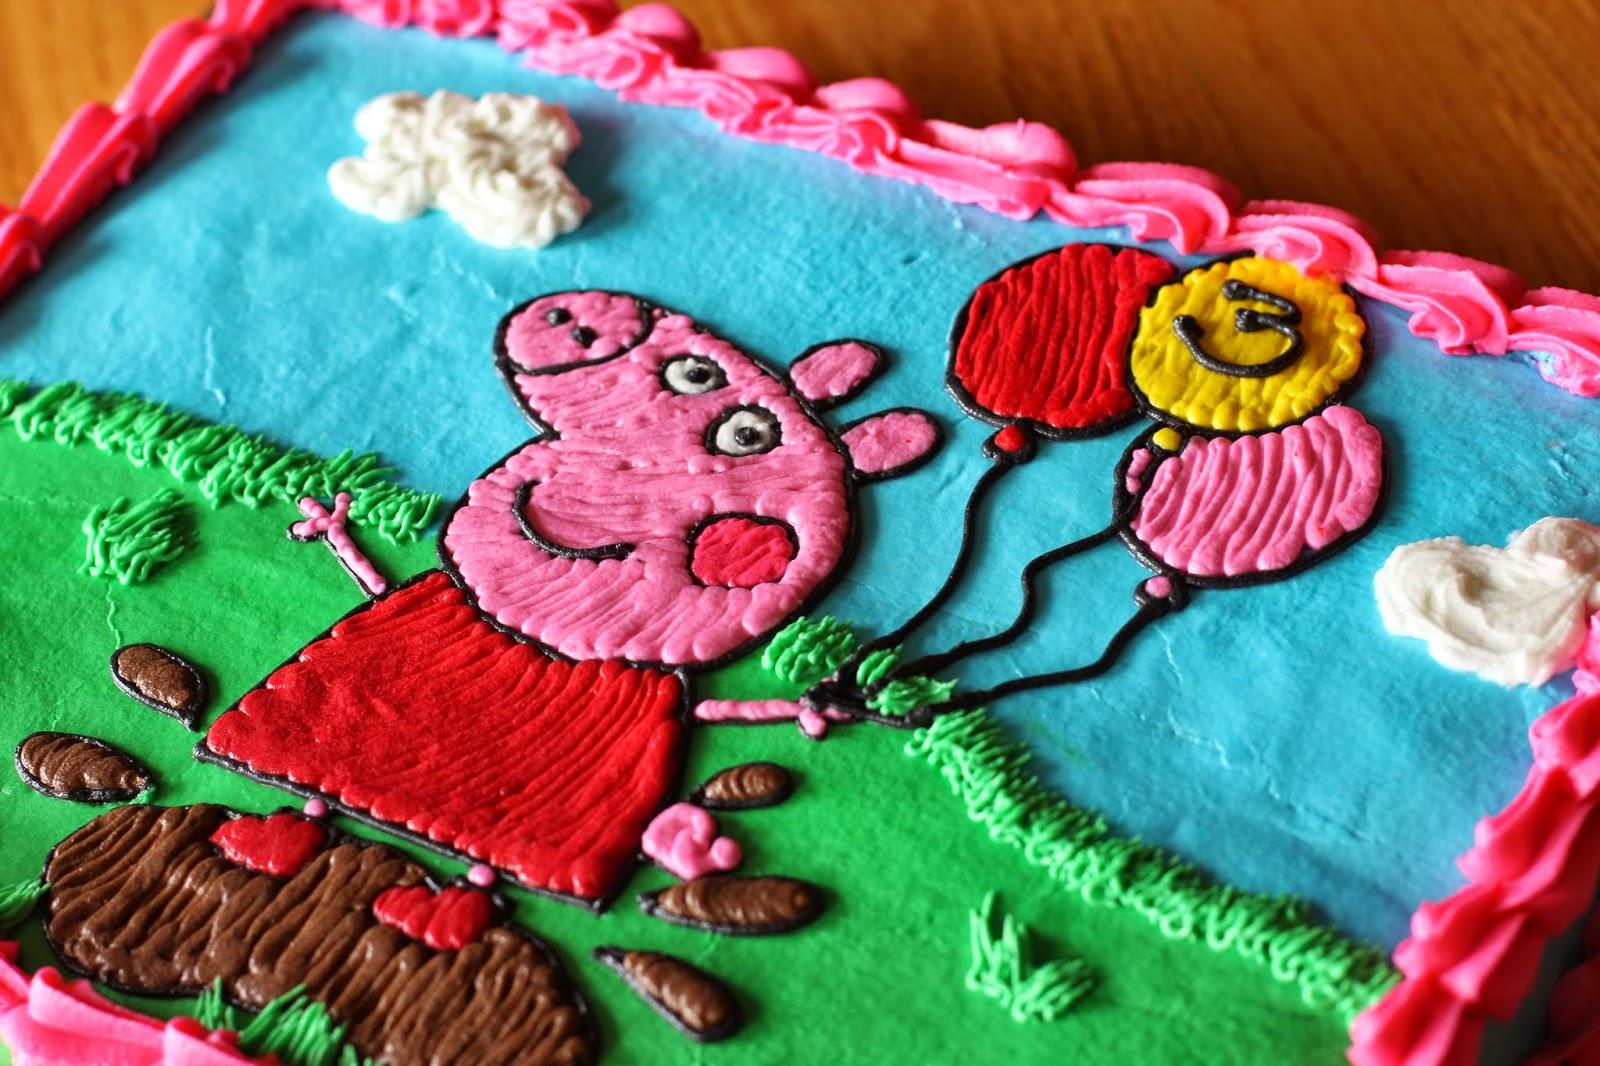 The Gano S Happy 3rd Bithday Peppa Pig Sheet Cake